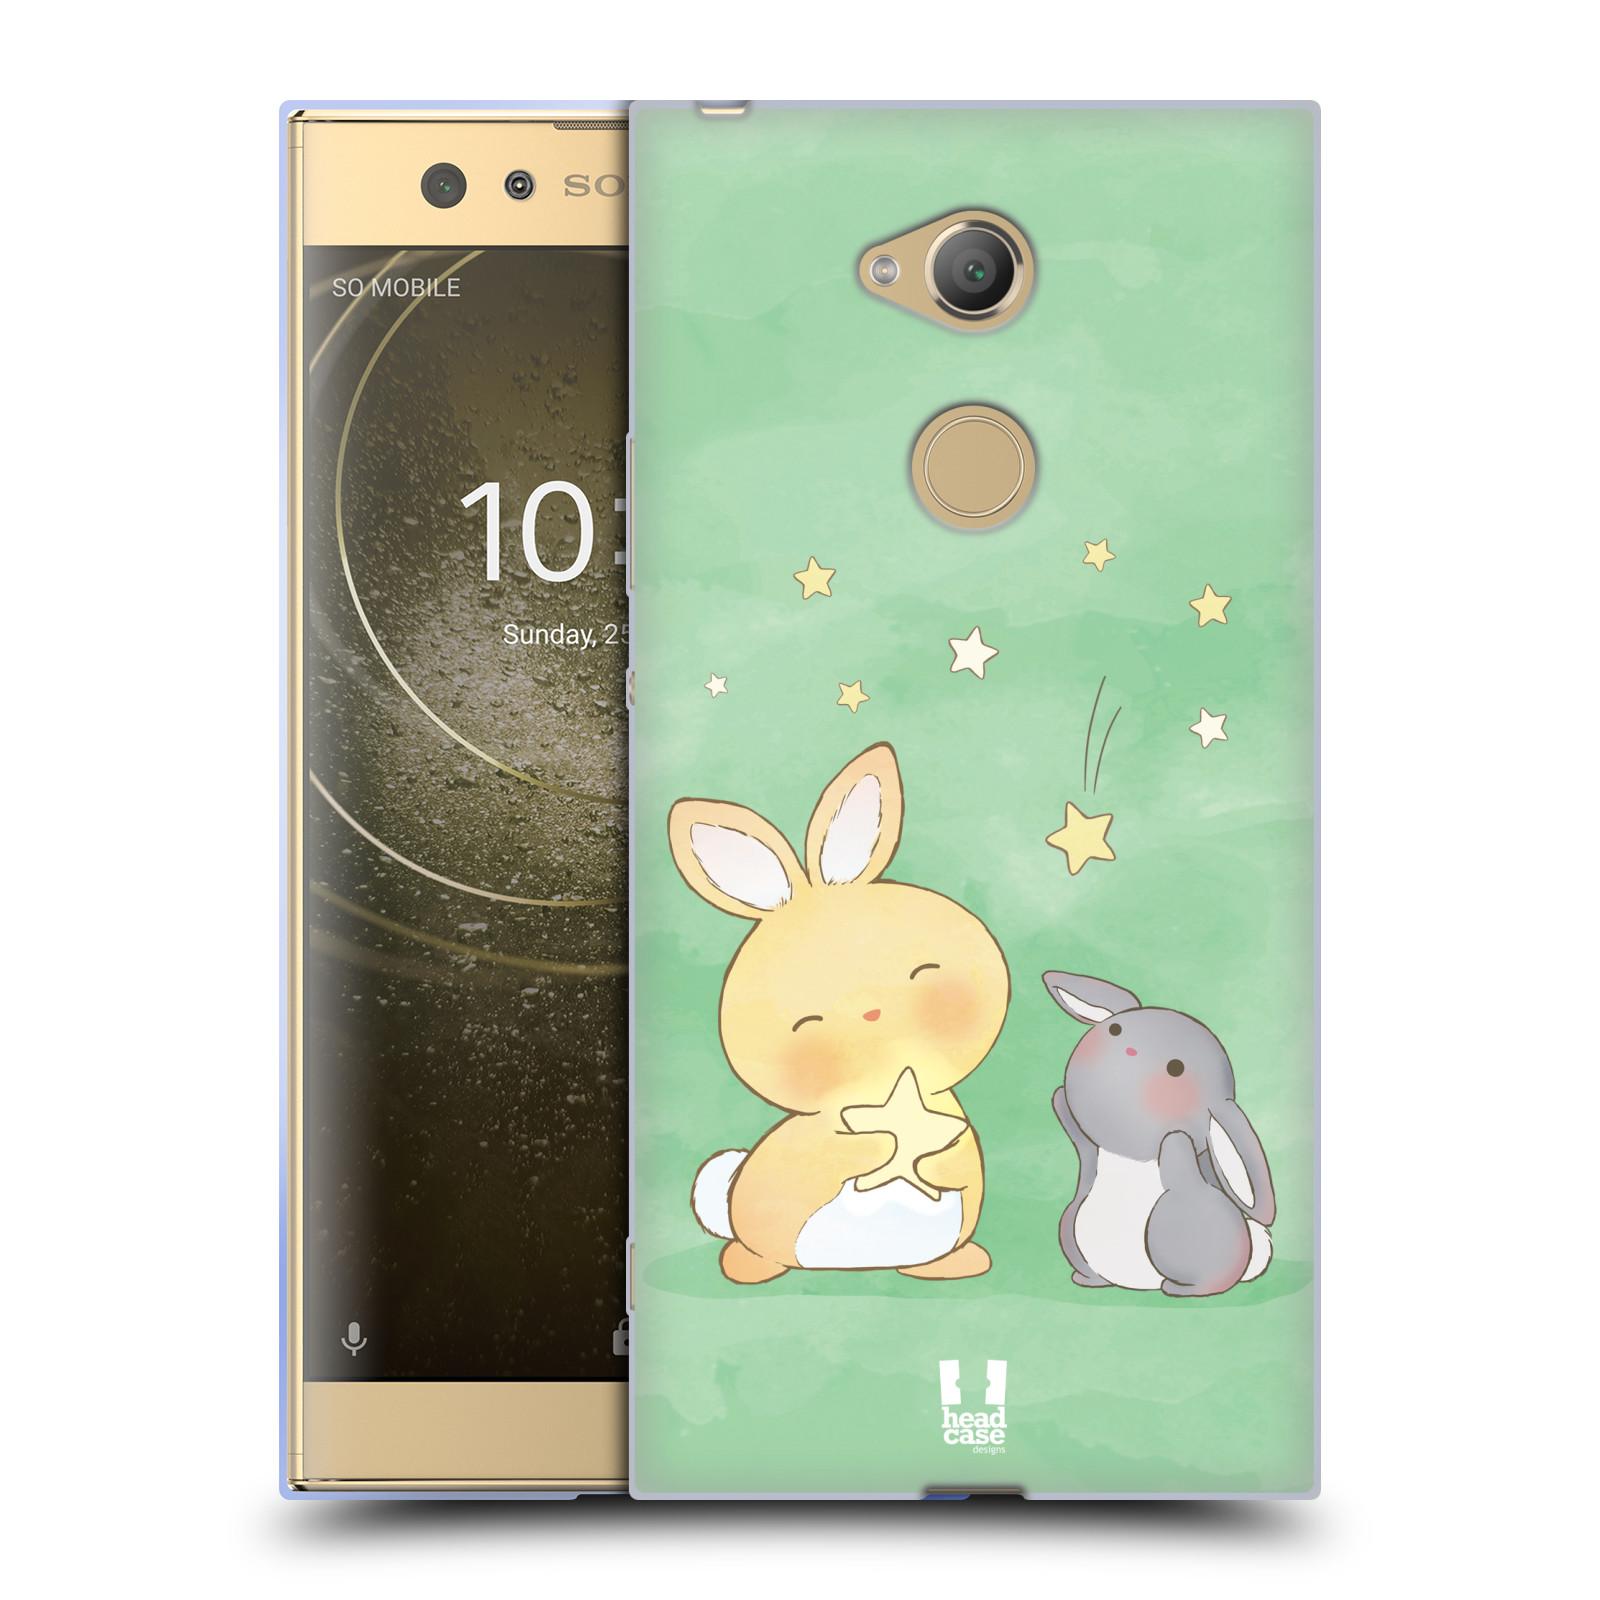 Pouzdro na mobil Sony Xperia XA2 Ultra vzor králíček a hvězdy zelená